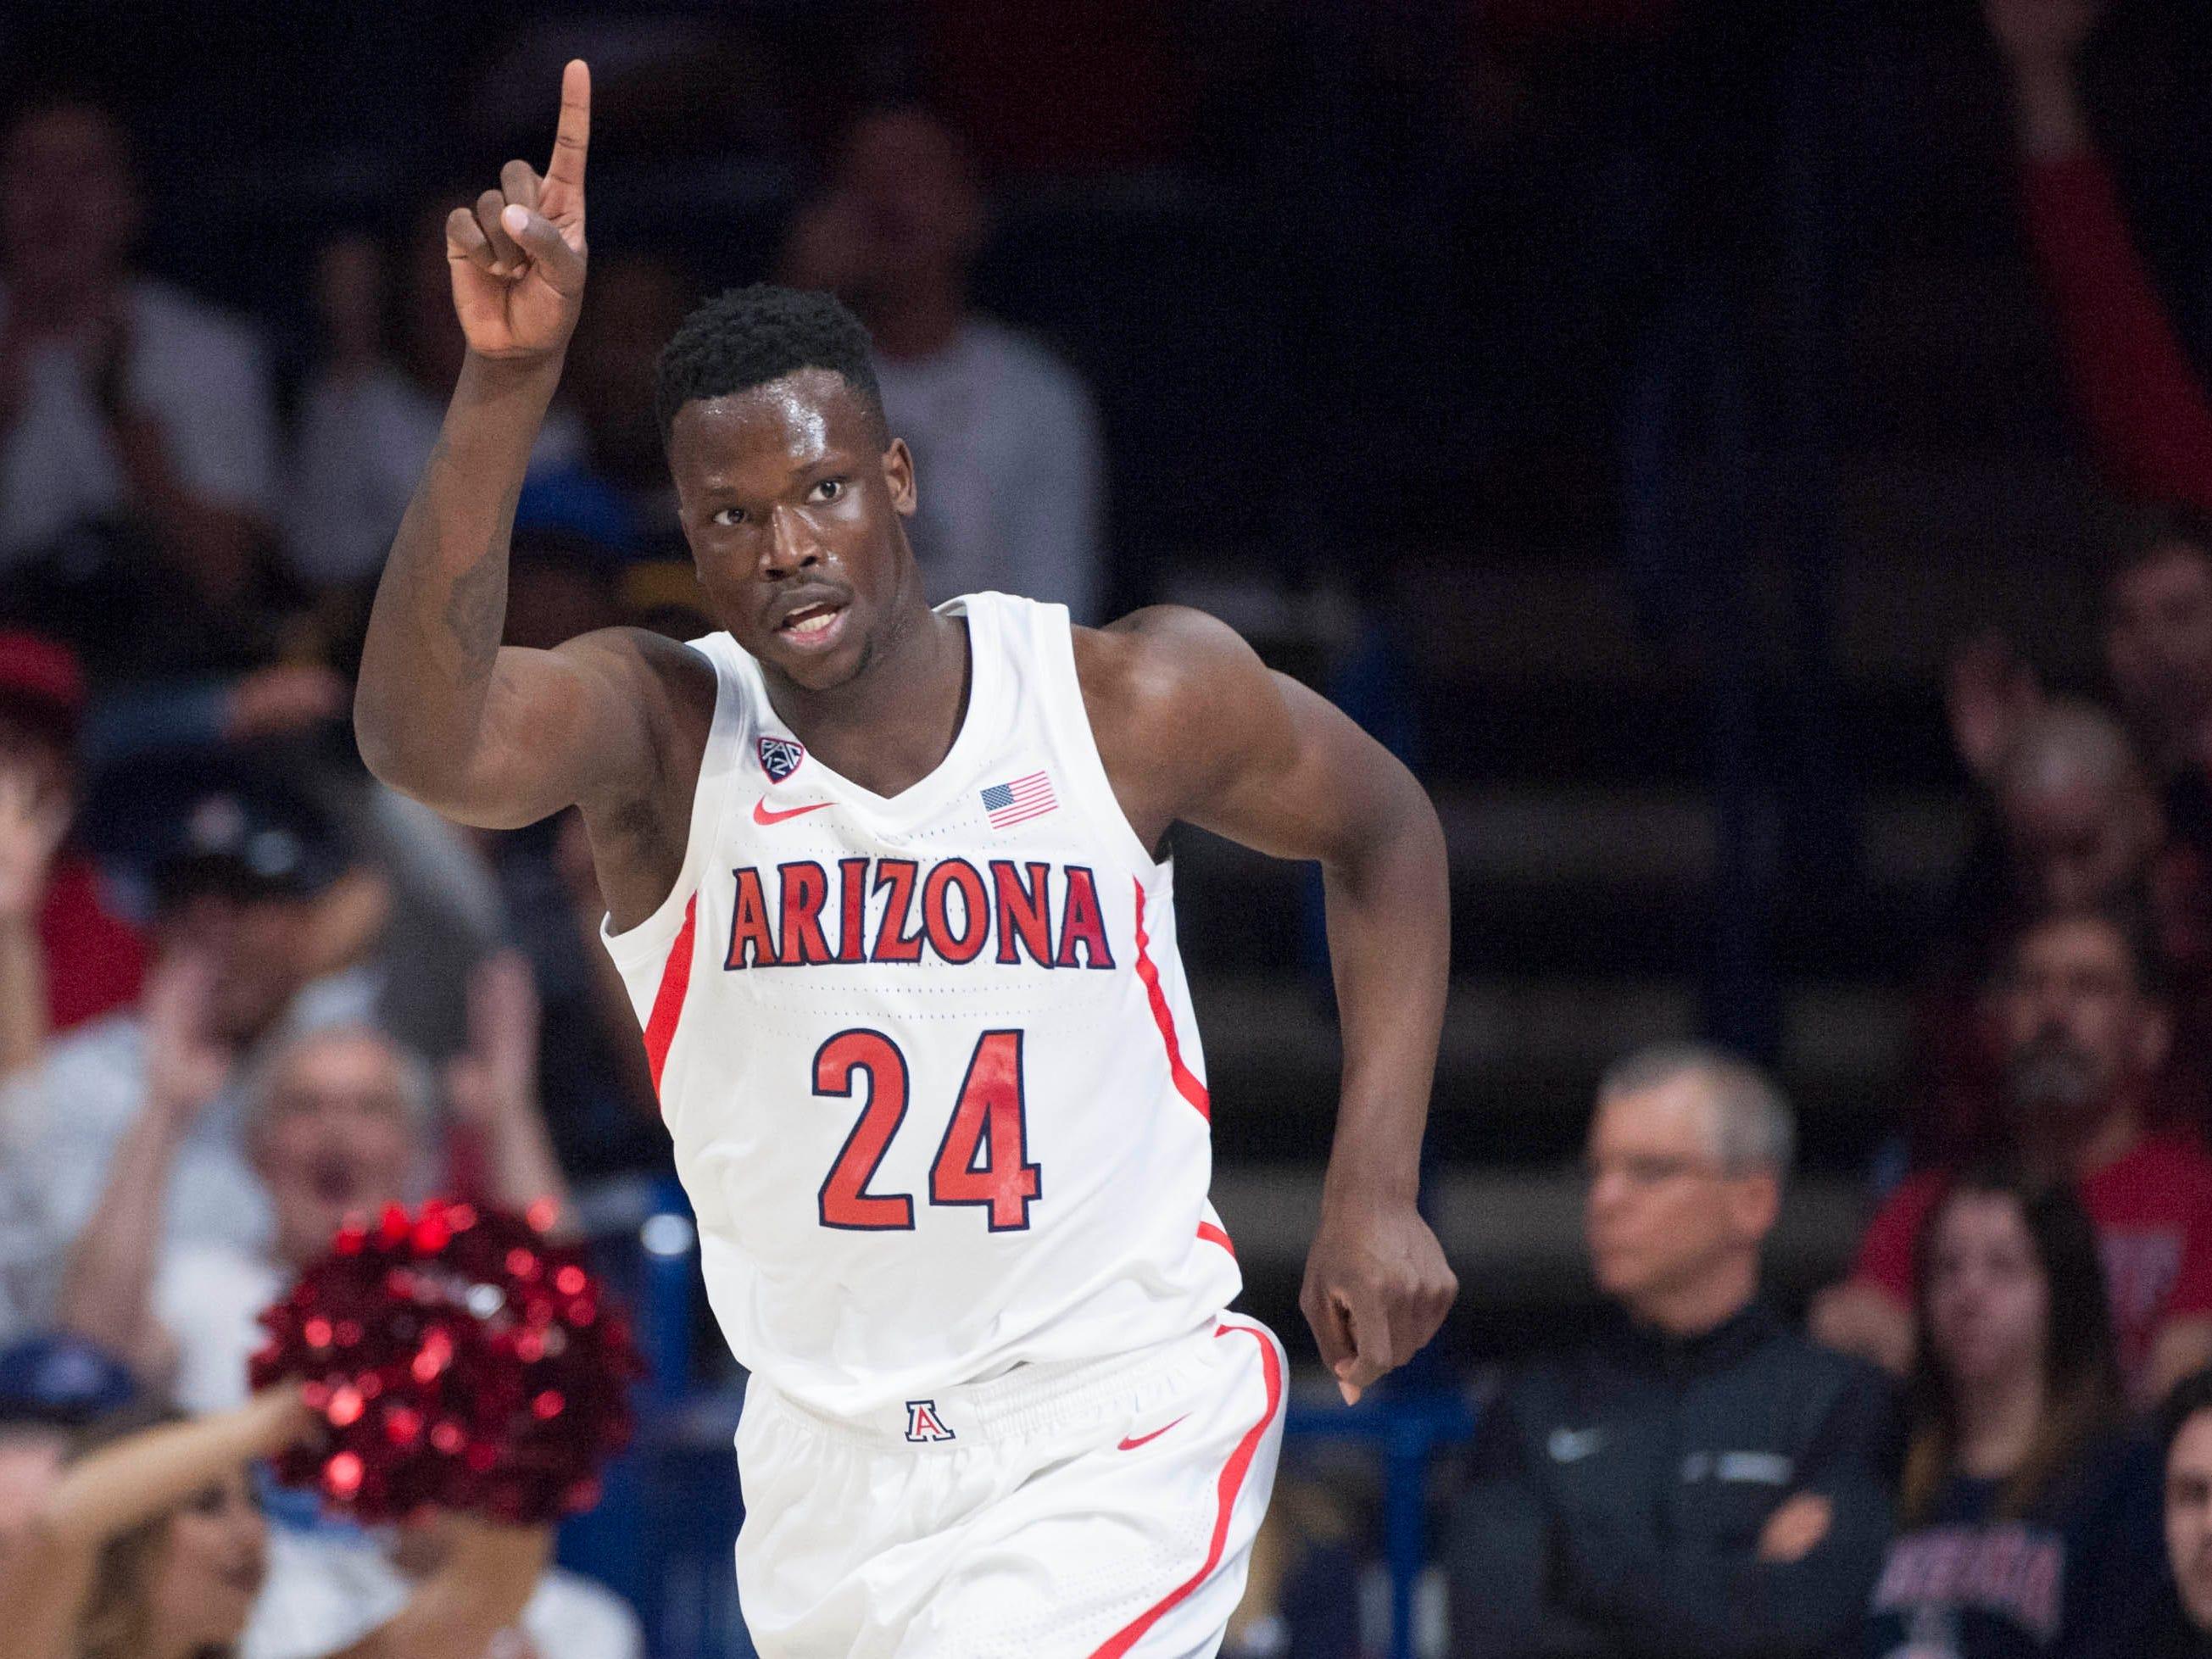 Dec 15, 2018; Tucson, AZ, USA; Arizona Wildcats guard Emmanuel Akot (24) celebrates after scoring against the Baylor Bears during the first half at McKale Center.